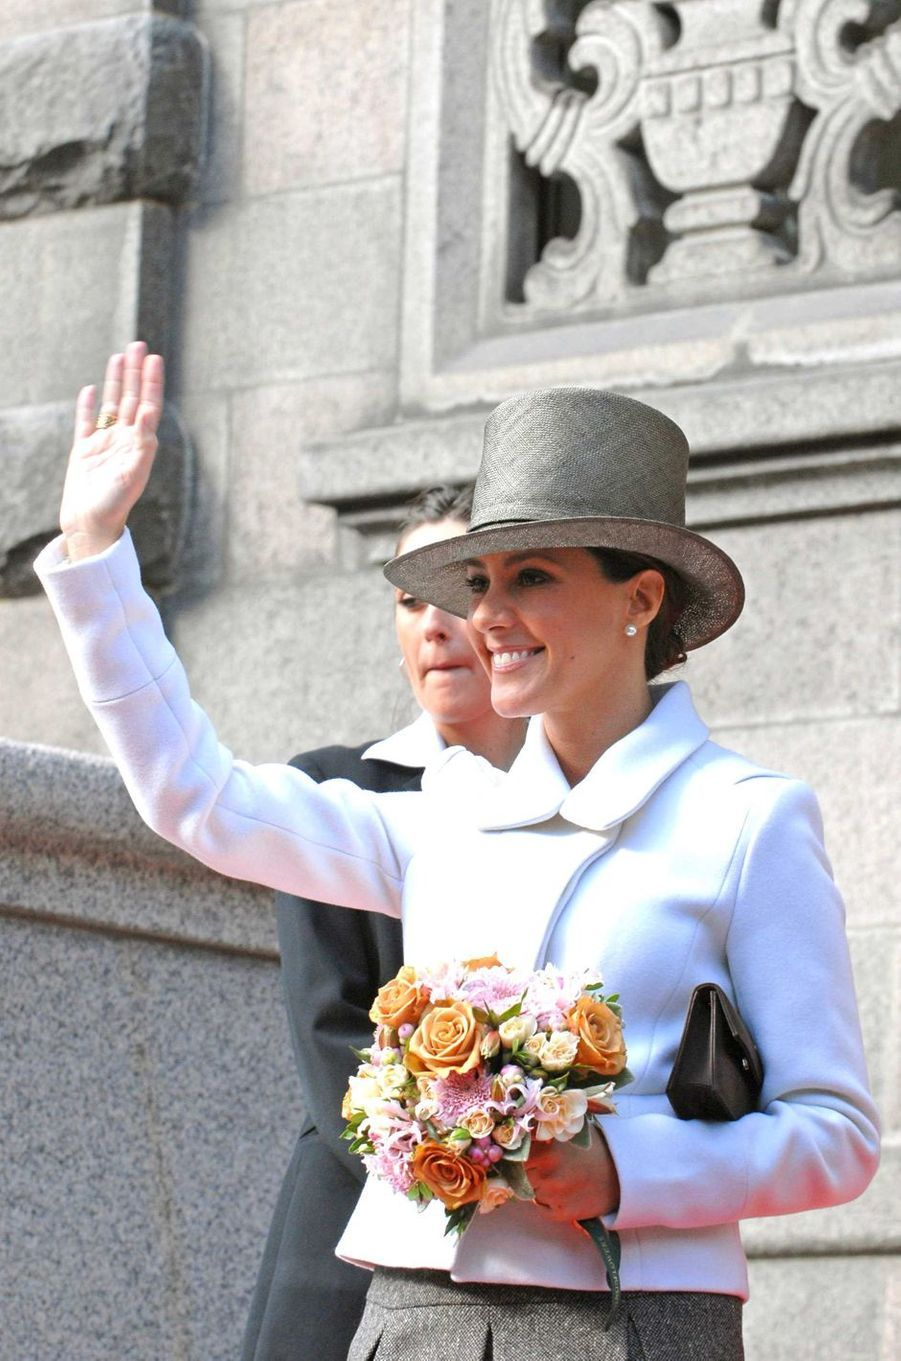 La princesse Marie de Danemark, le 7 octobre 2008